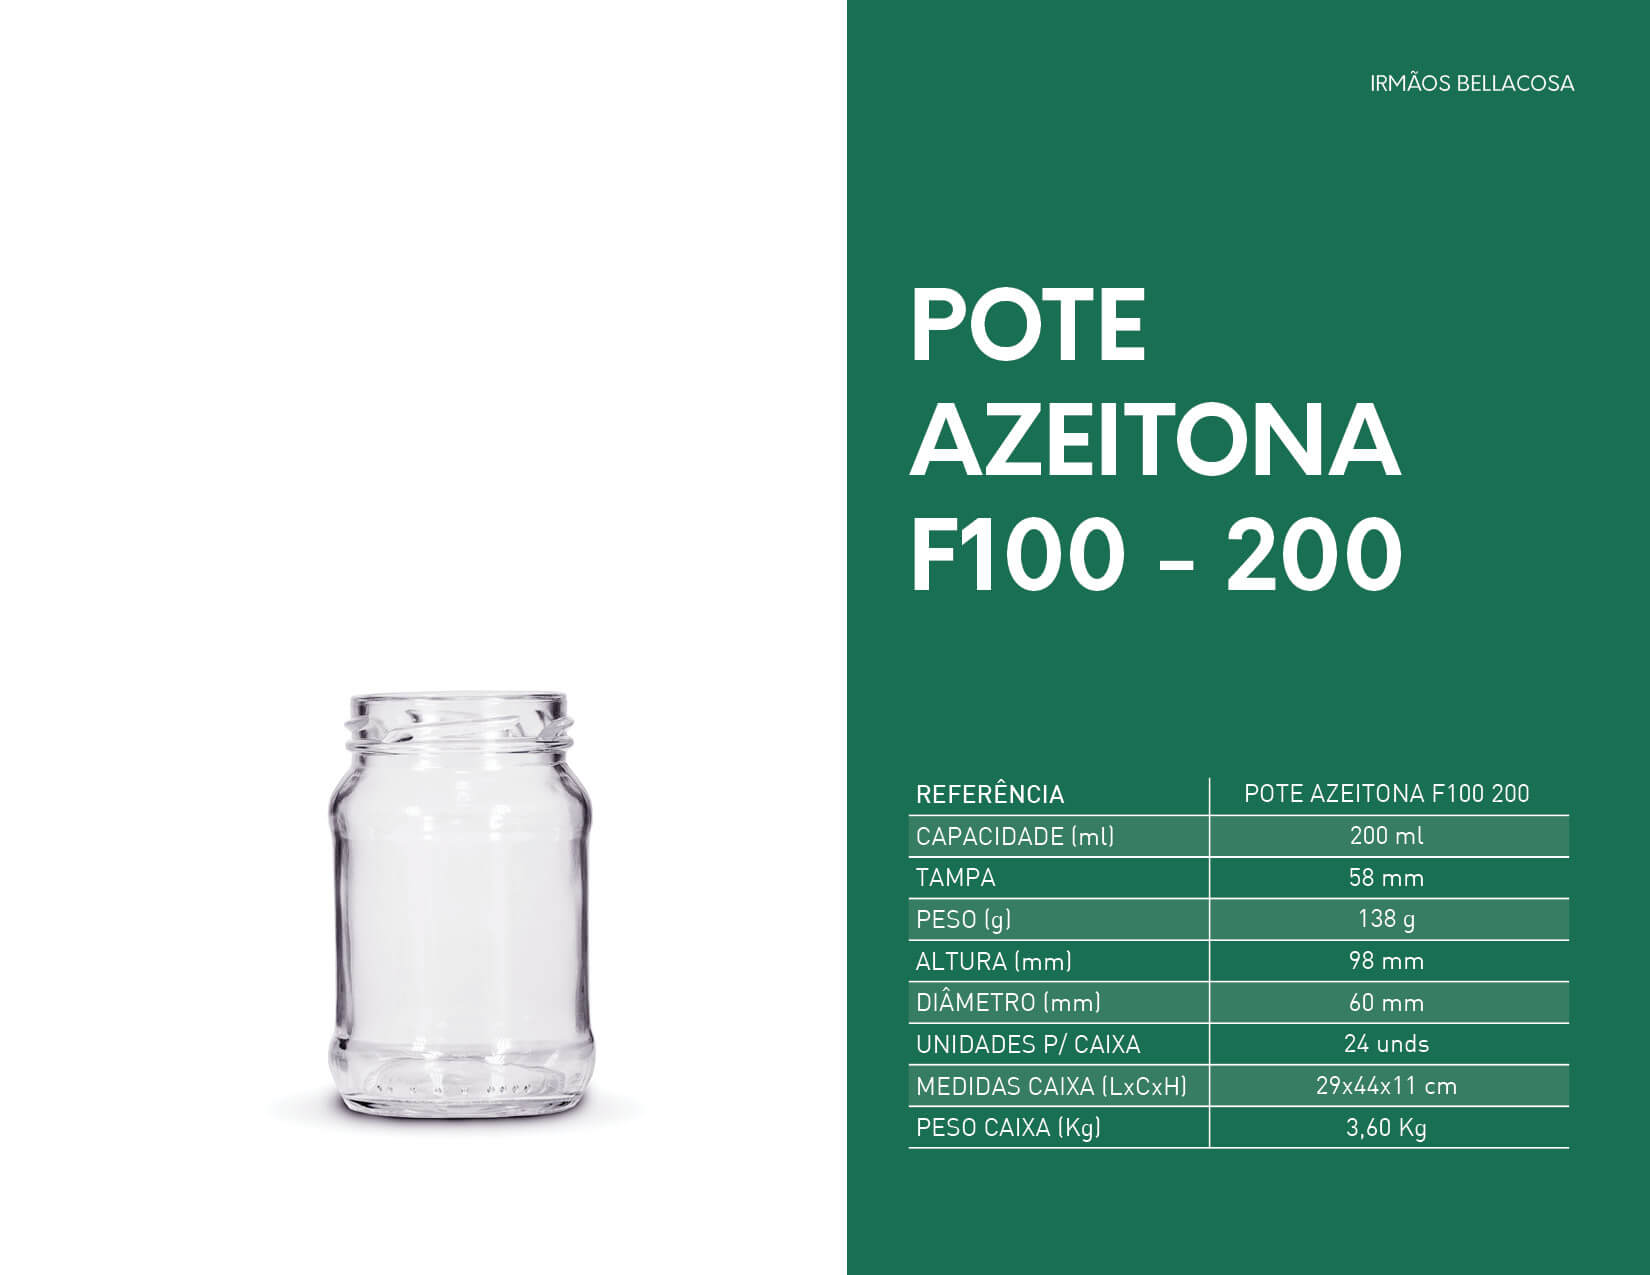 022-Pote-Azeitona-F100-200-irmaos-bellacosa-embalagens-de-vidro